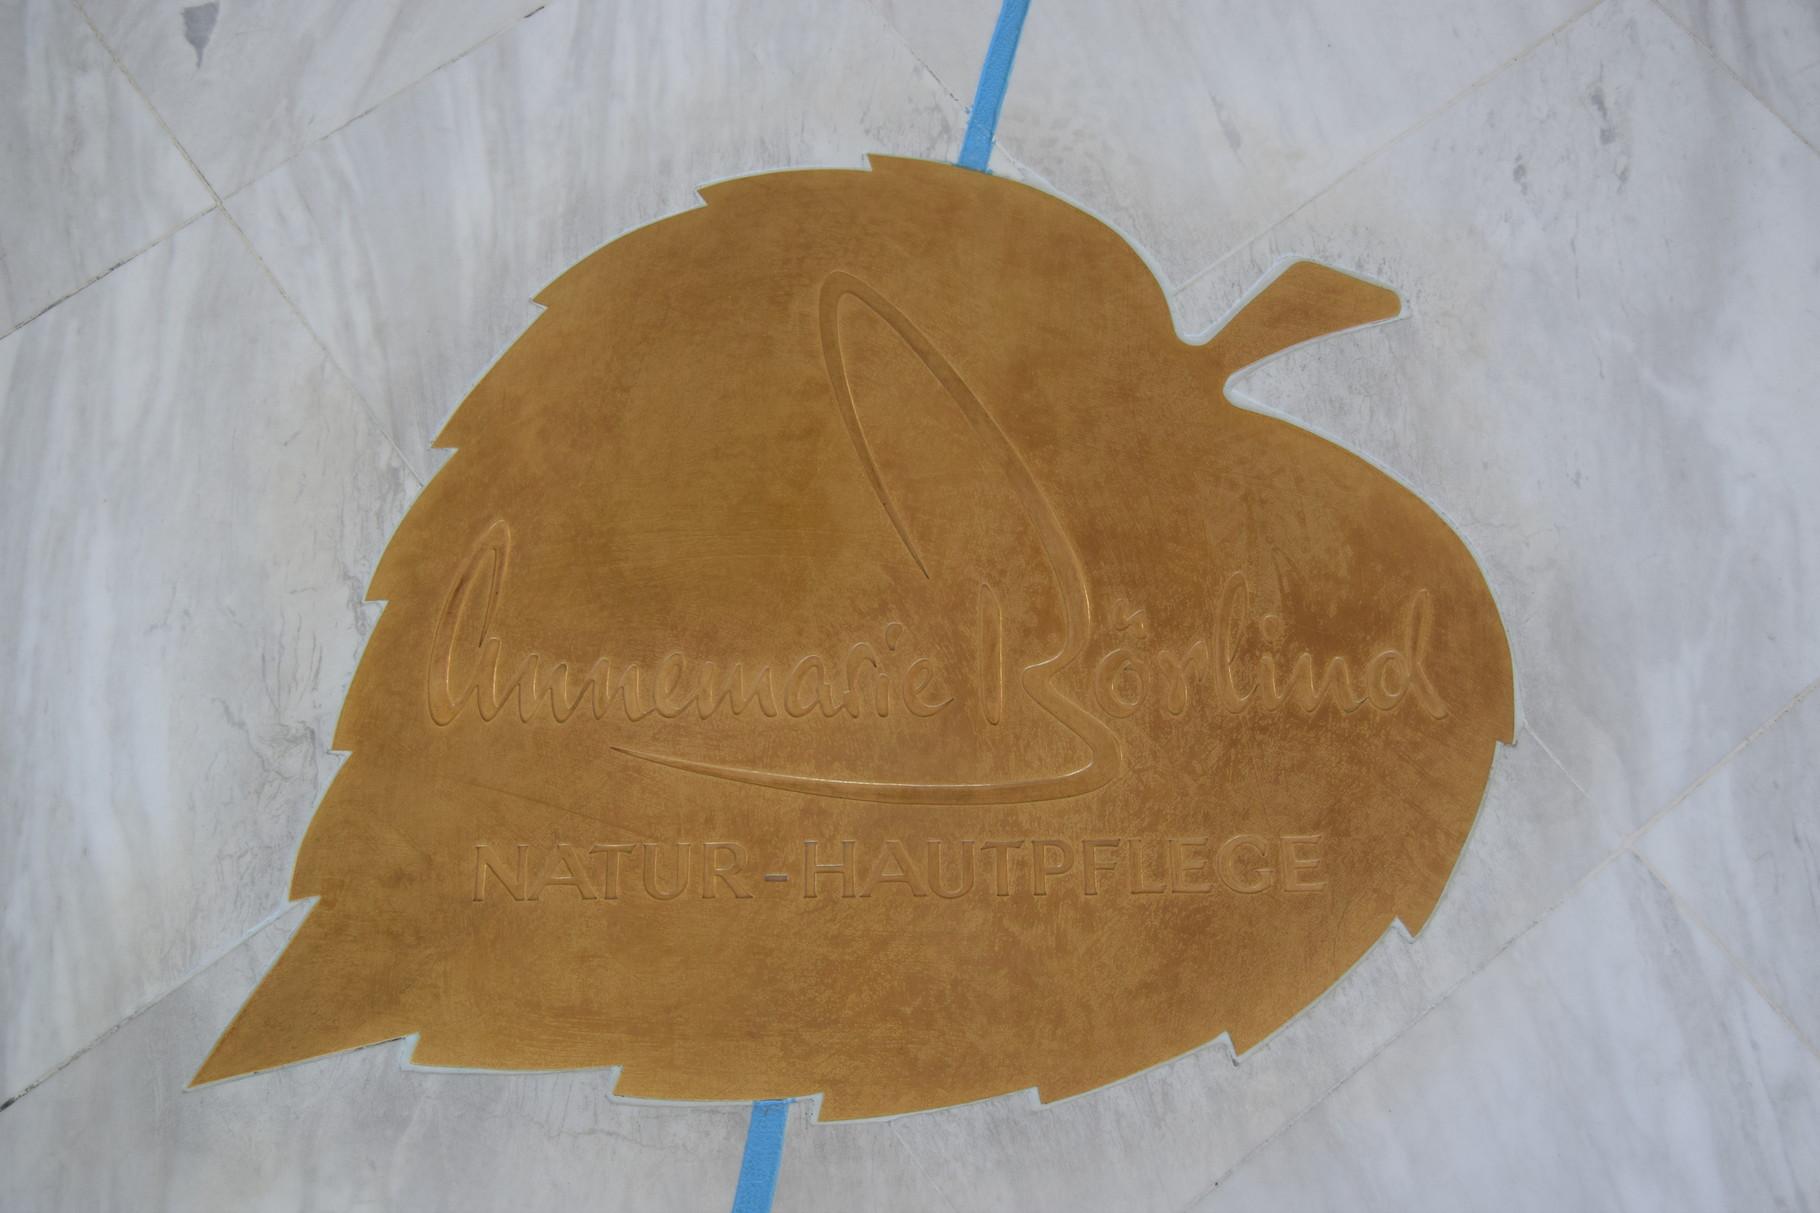 ufh Forum Eingang Fußboden Logo Annmarie Börlind Naturkosmetik